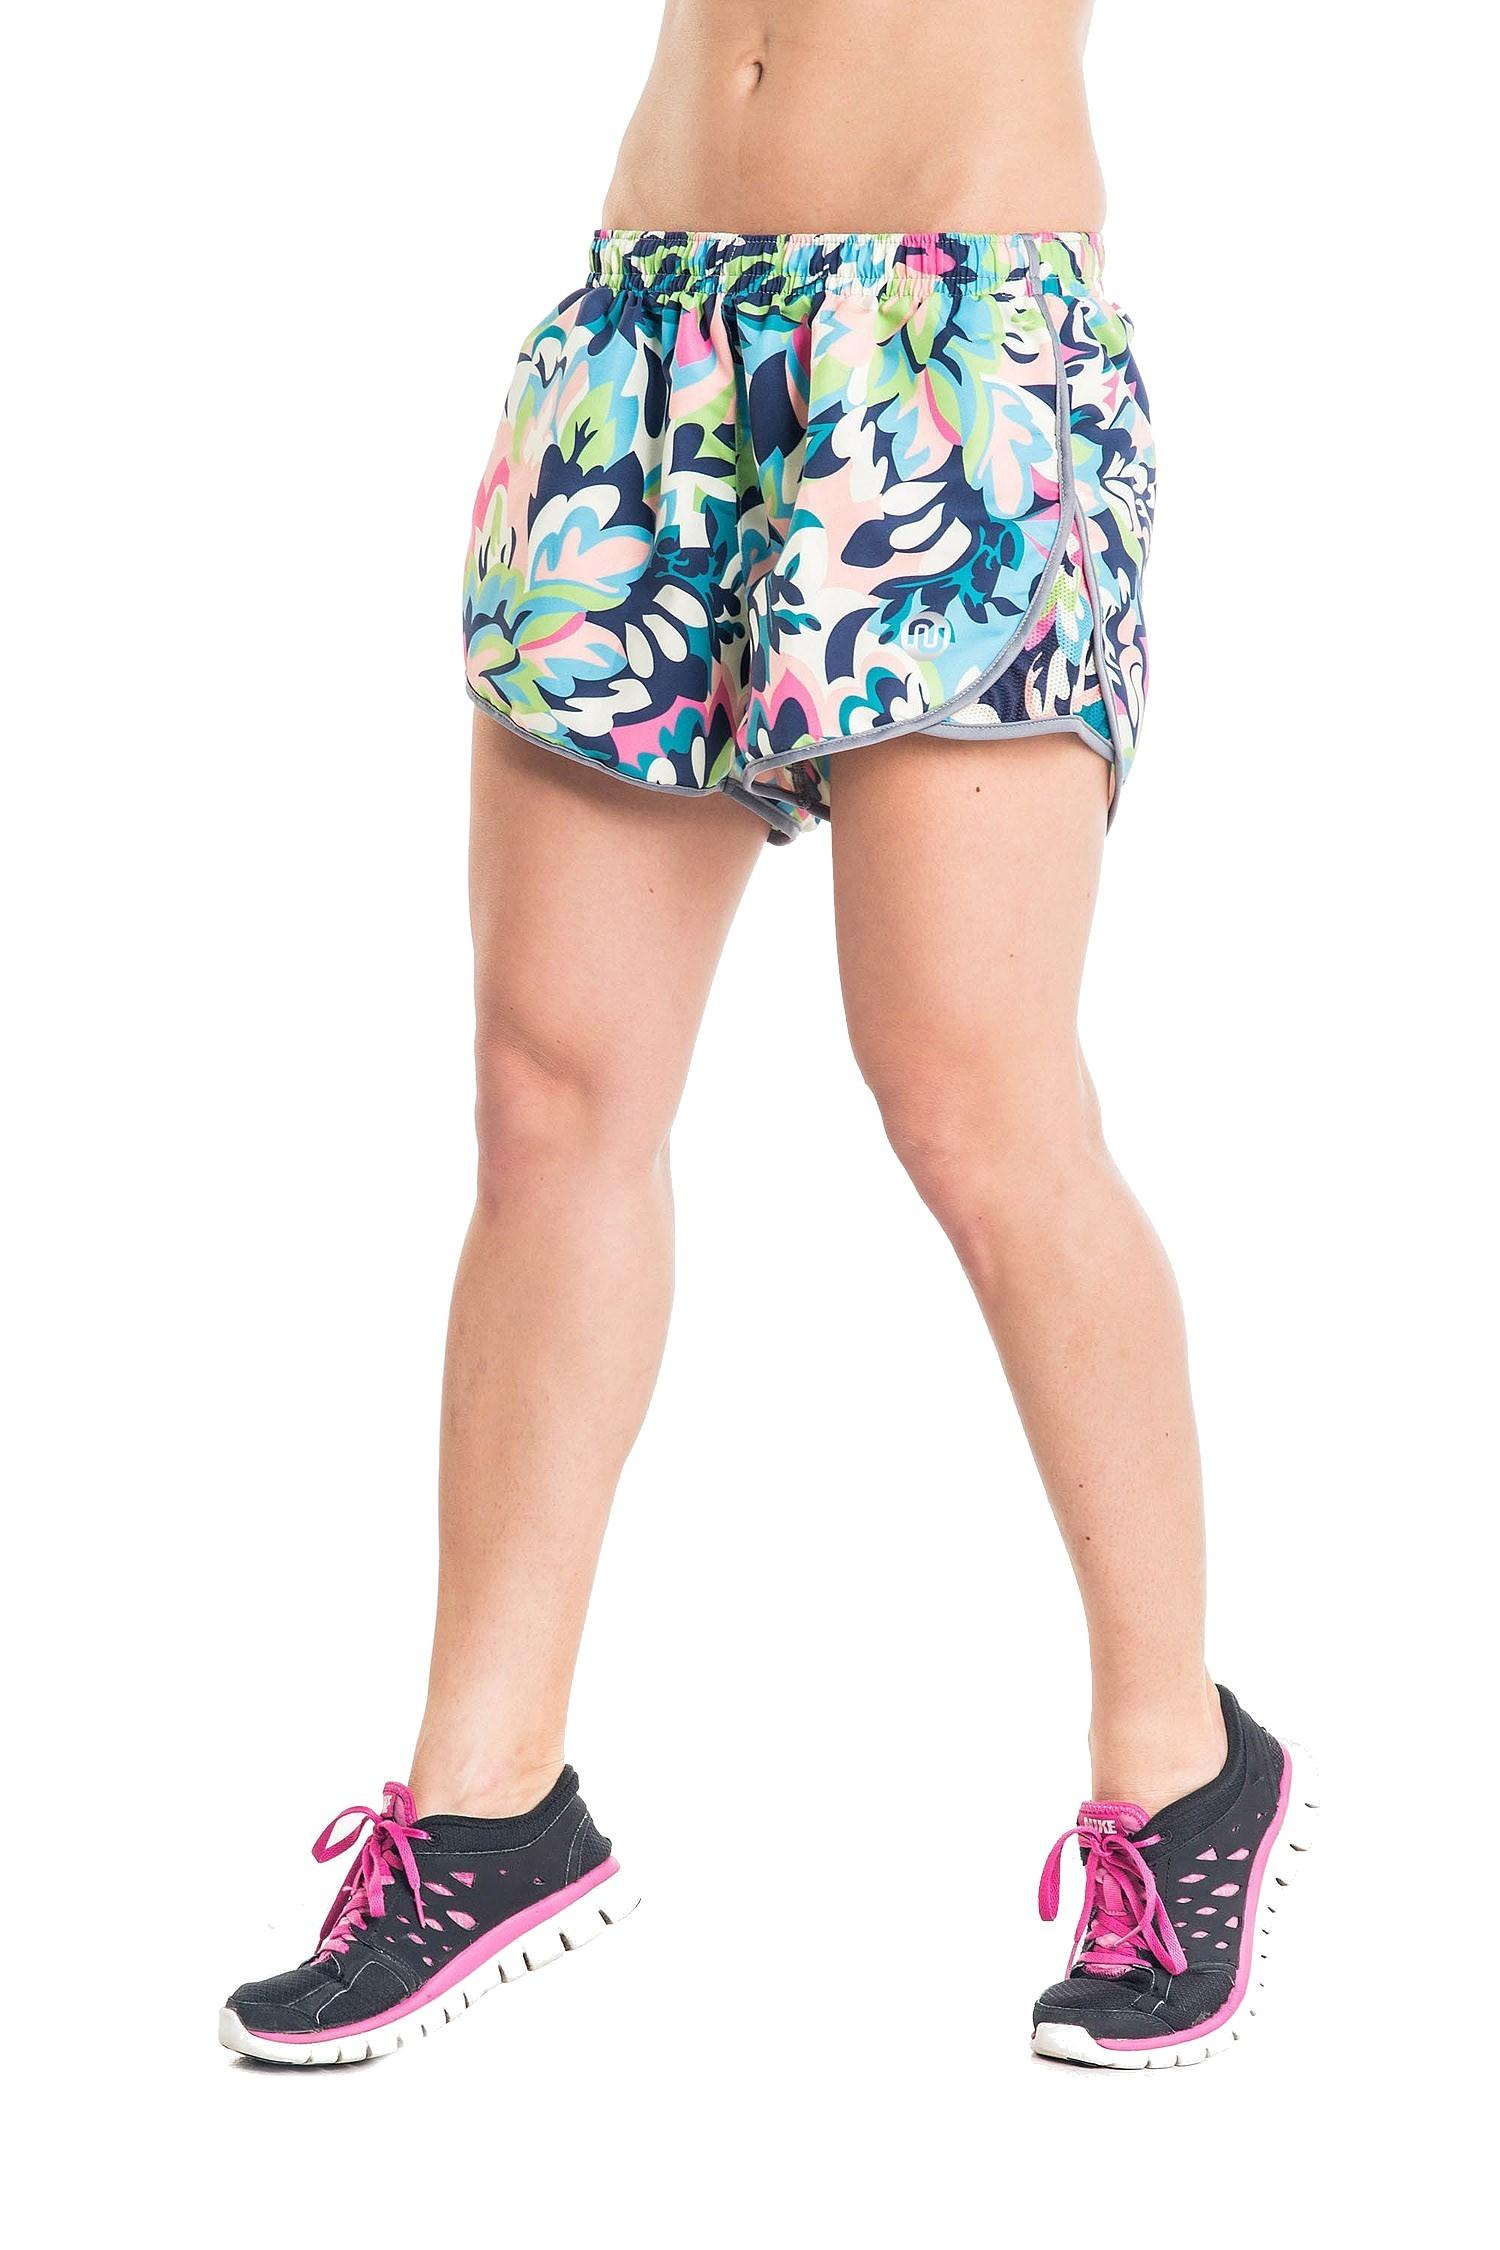 nessi damen shorts dsl kurze hose laufhose fitnesshose atmungsaktiv green flowers prosske. Black Bedroom Furniture Sets. Home Design Ideas